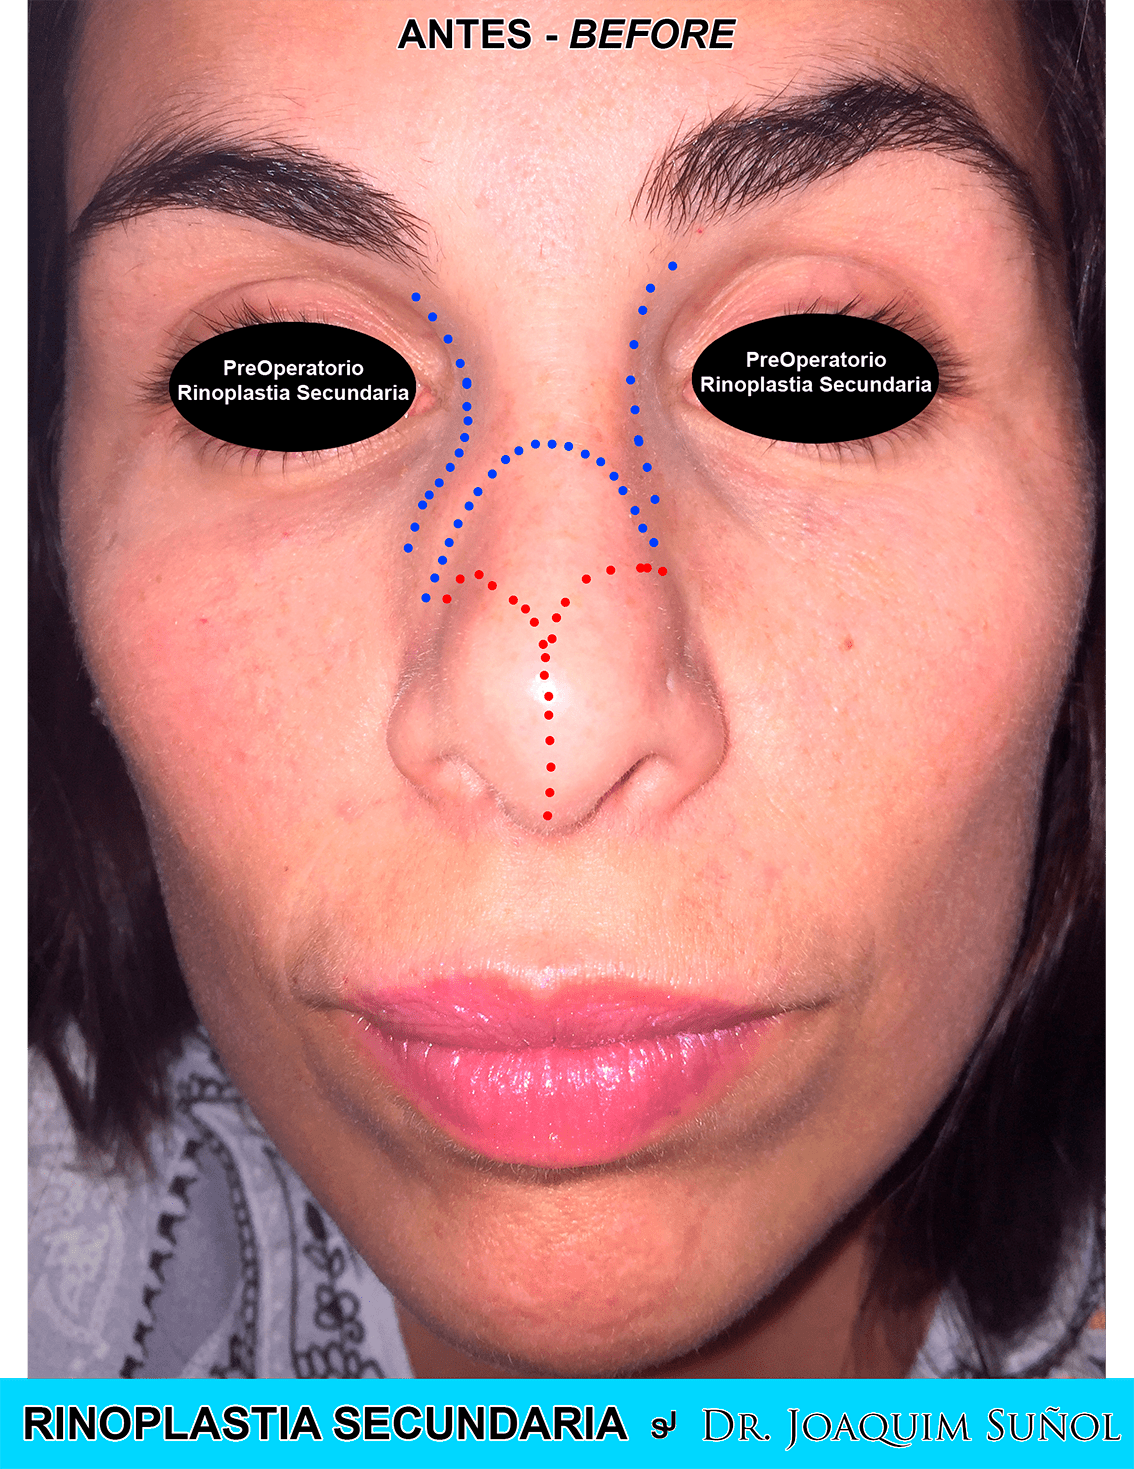 Rinoplastia Secundaria cirugia plastioca estetica joaquim suñol barcelona preop